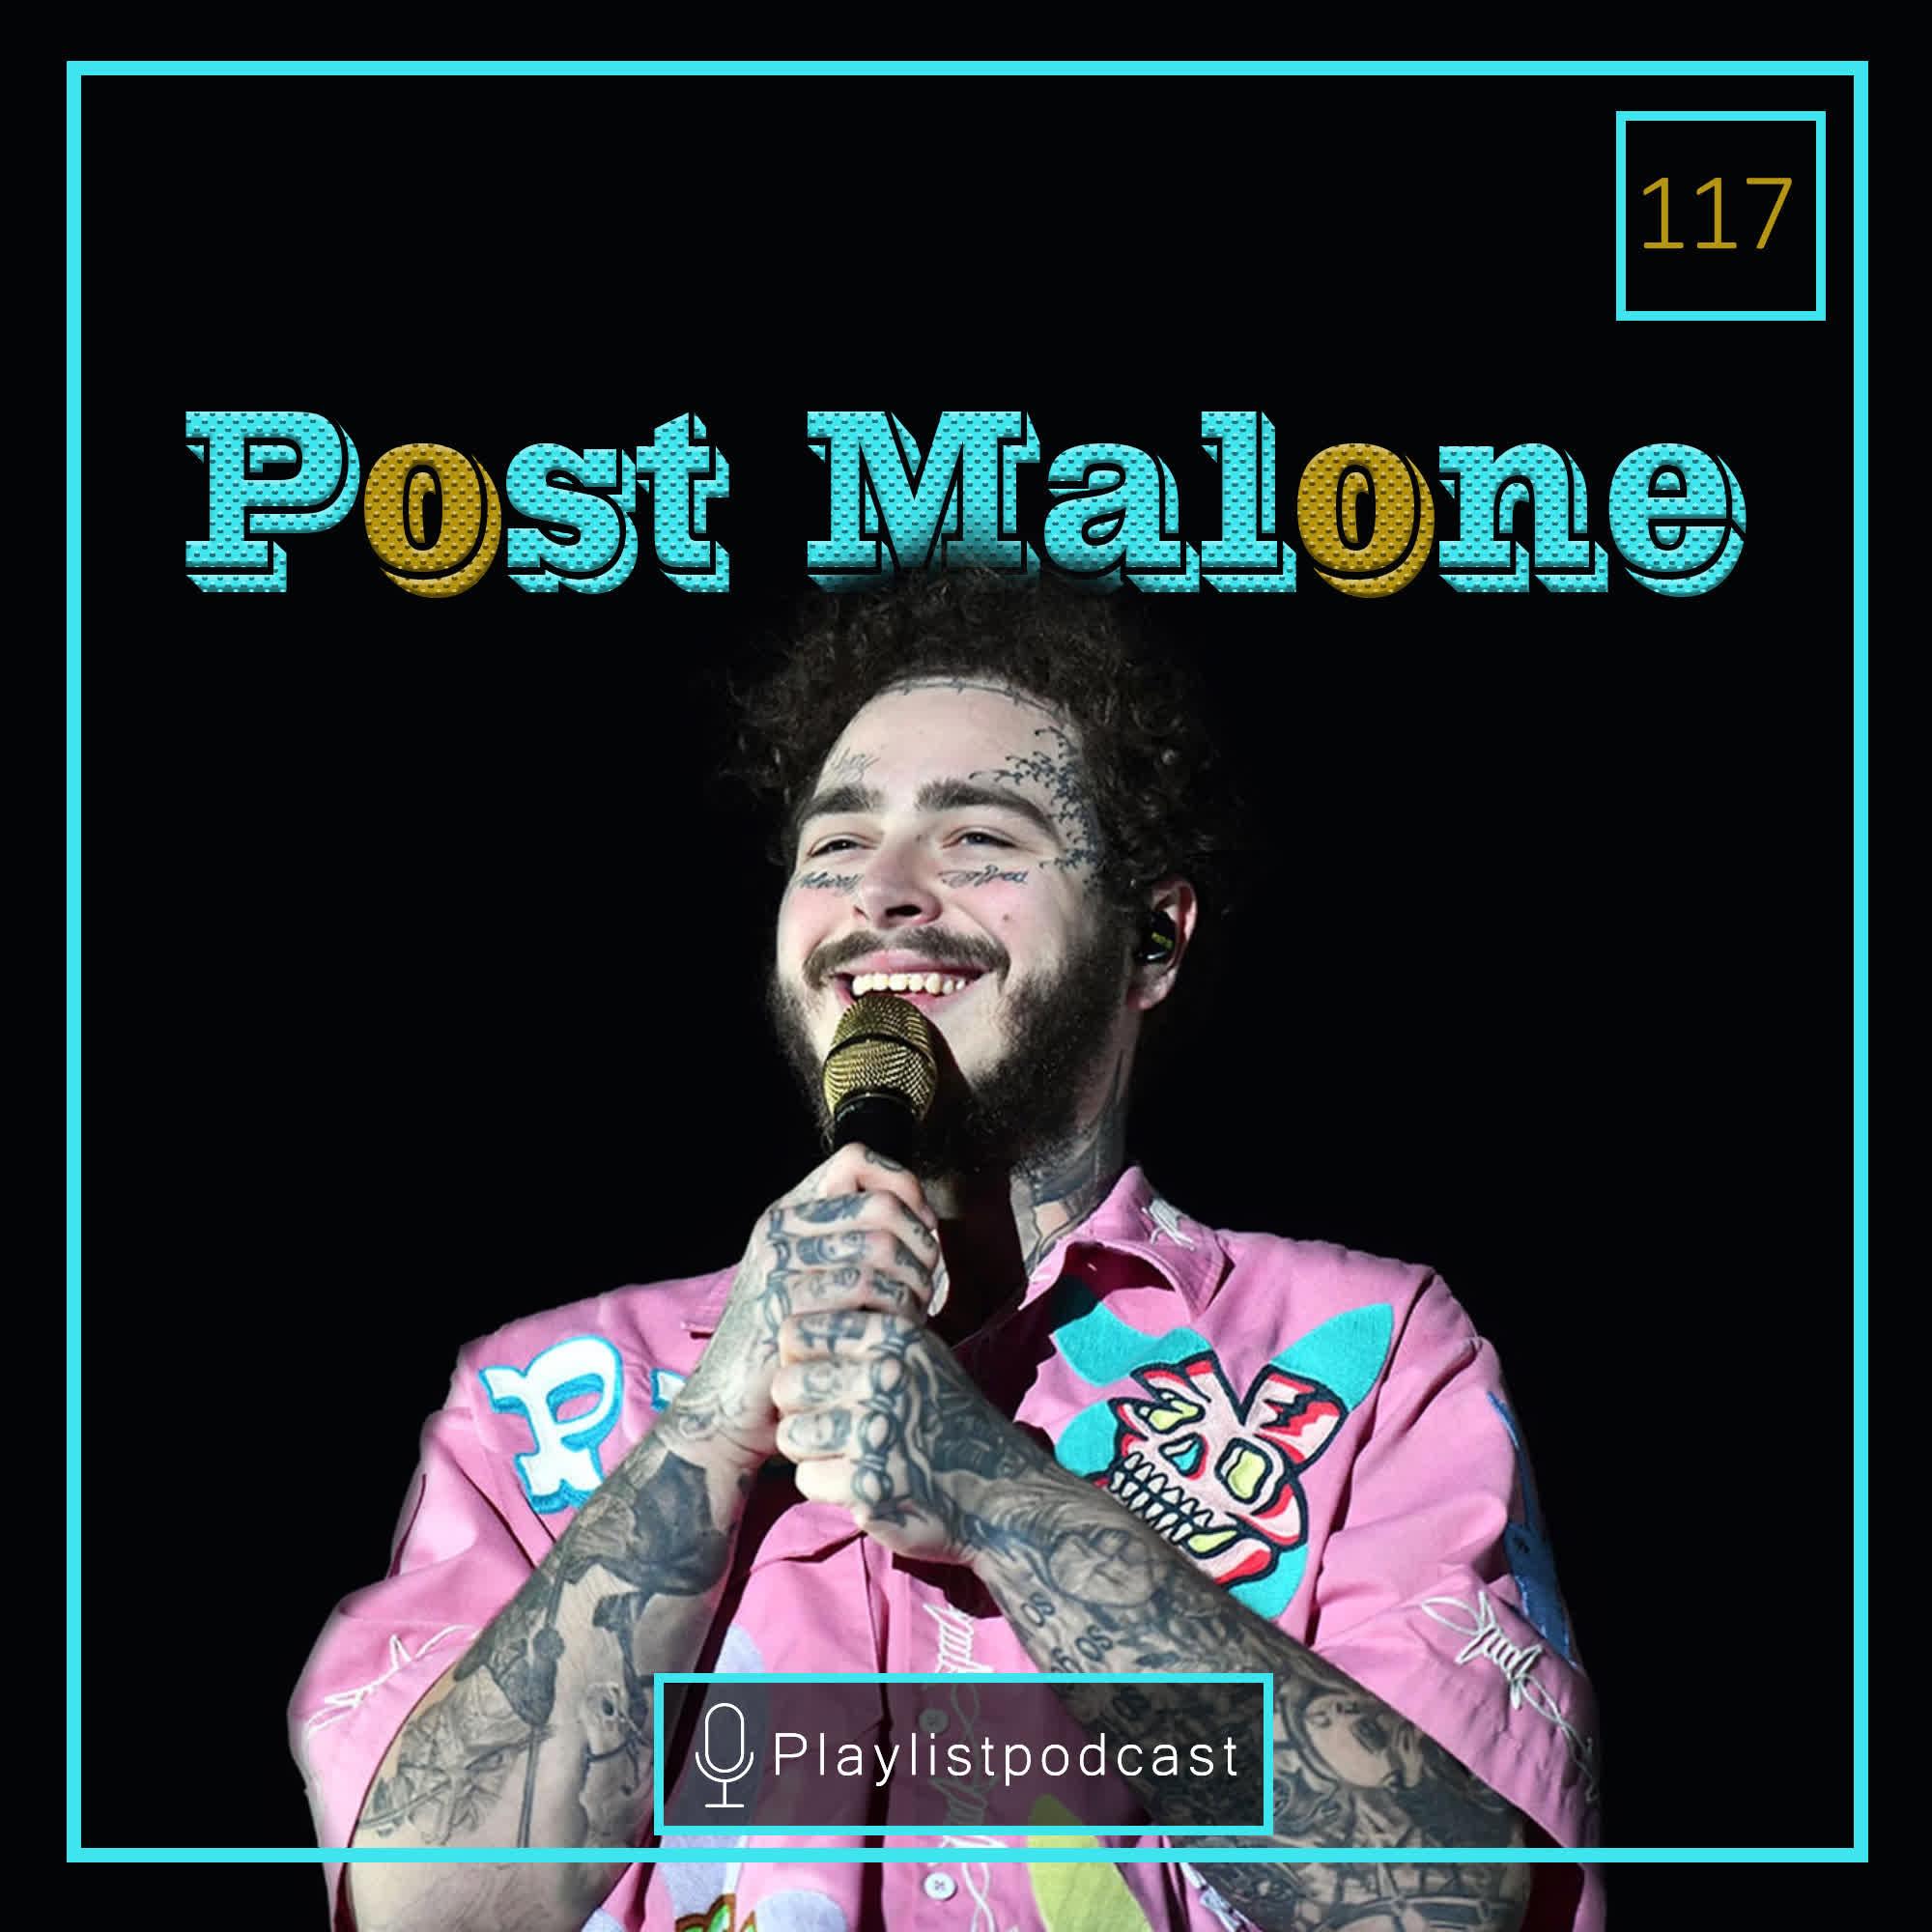 LIVE 117 - Post Malone - پلی لیست لایو